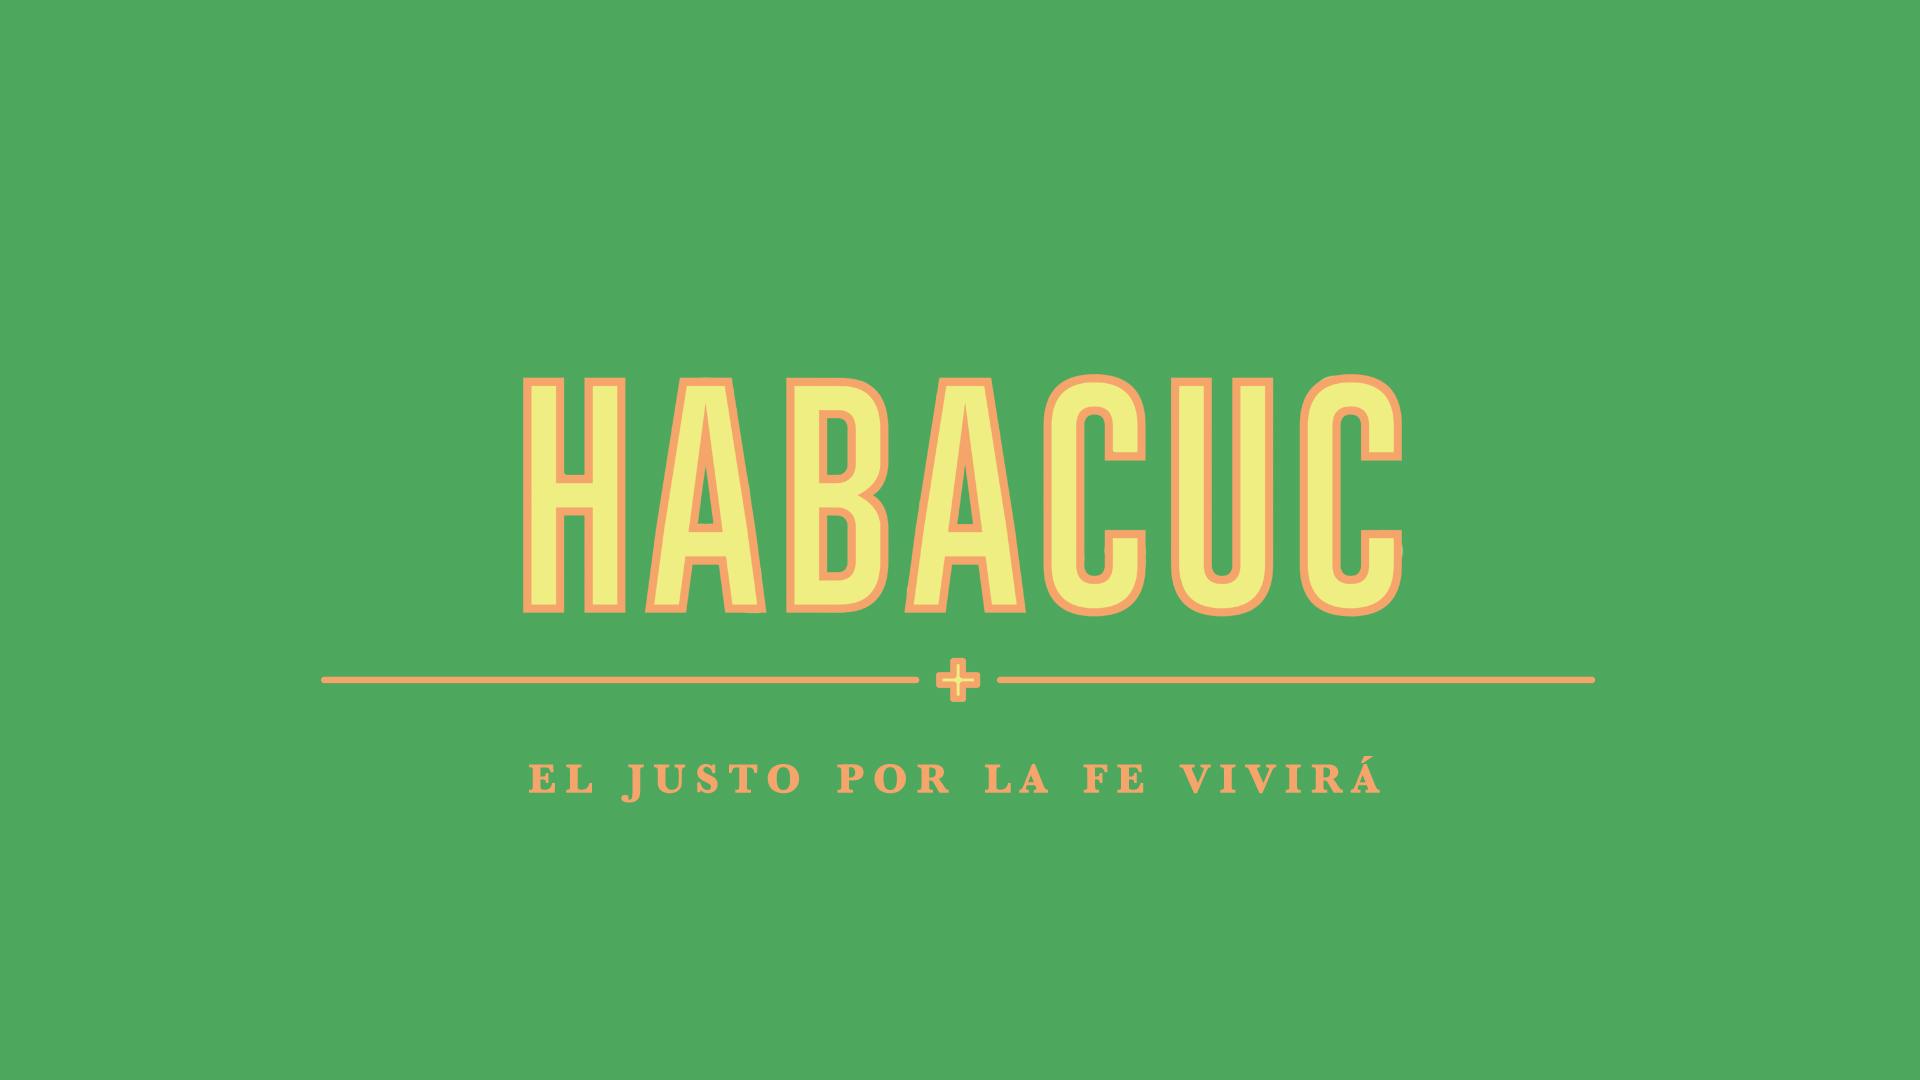 habacuc-logo.jpg